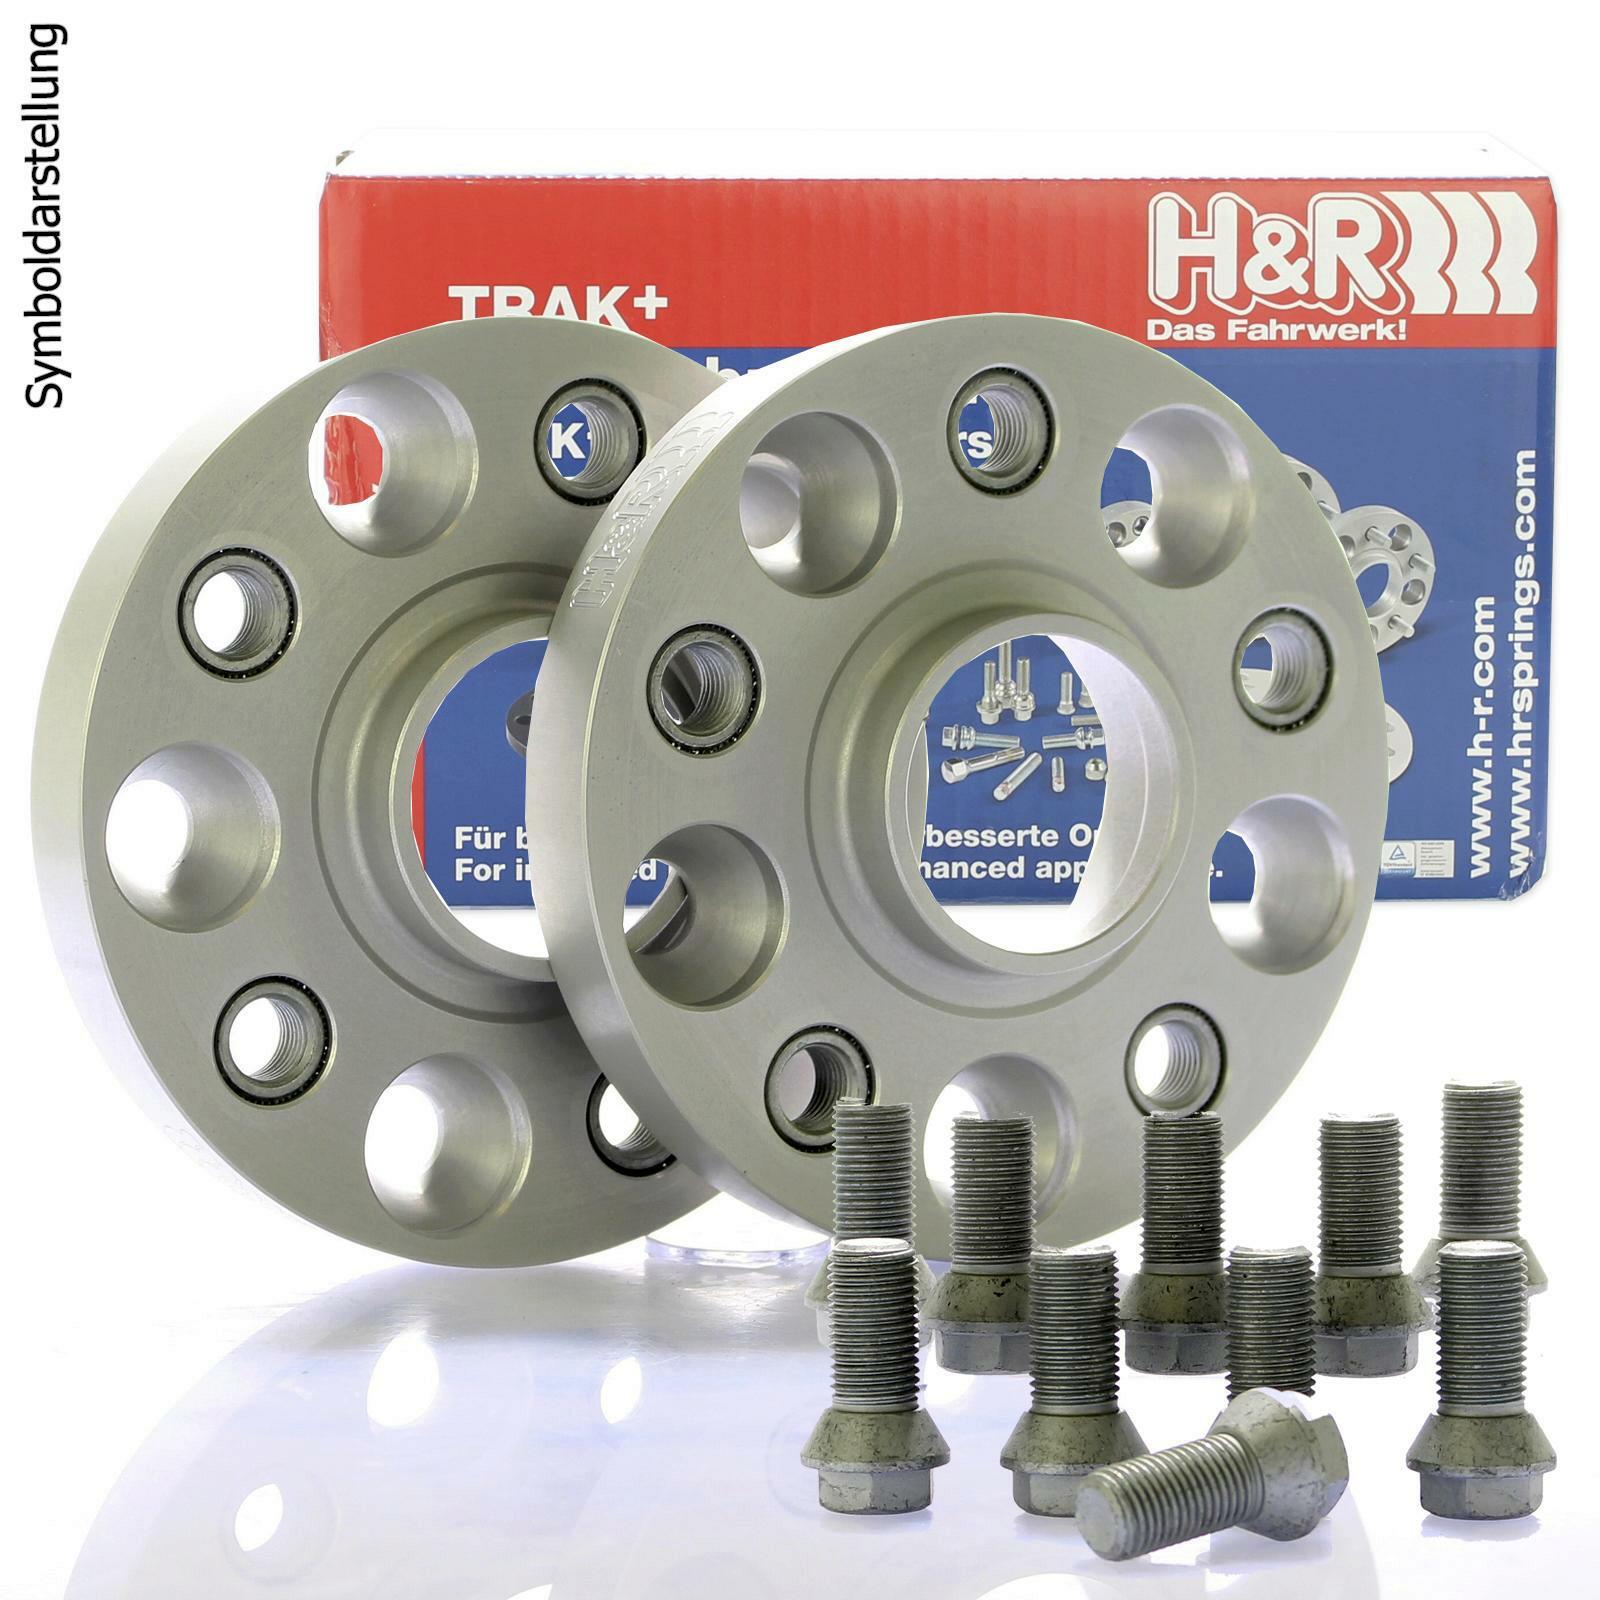 H&R DRA Spurplatten Spurverbreiterung Distanzscheibe 5x112 40mm// 2x20mm